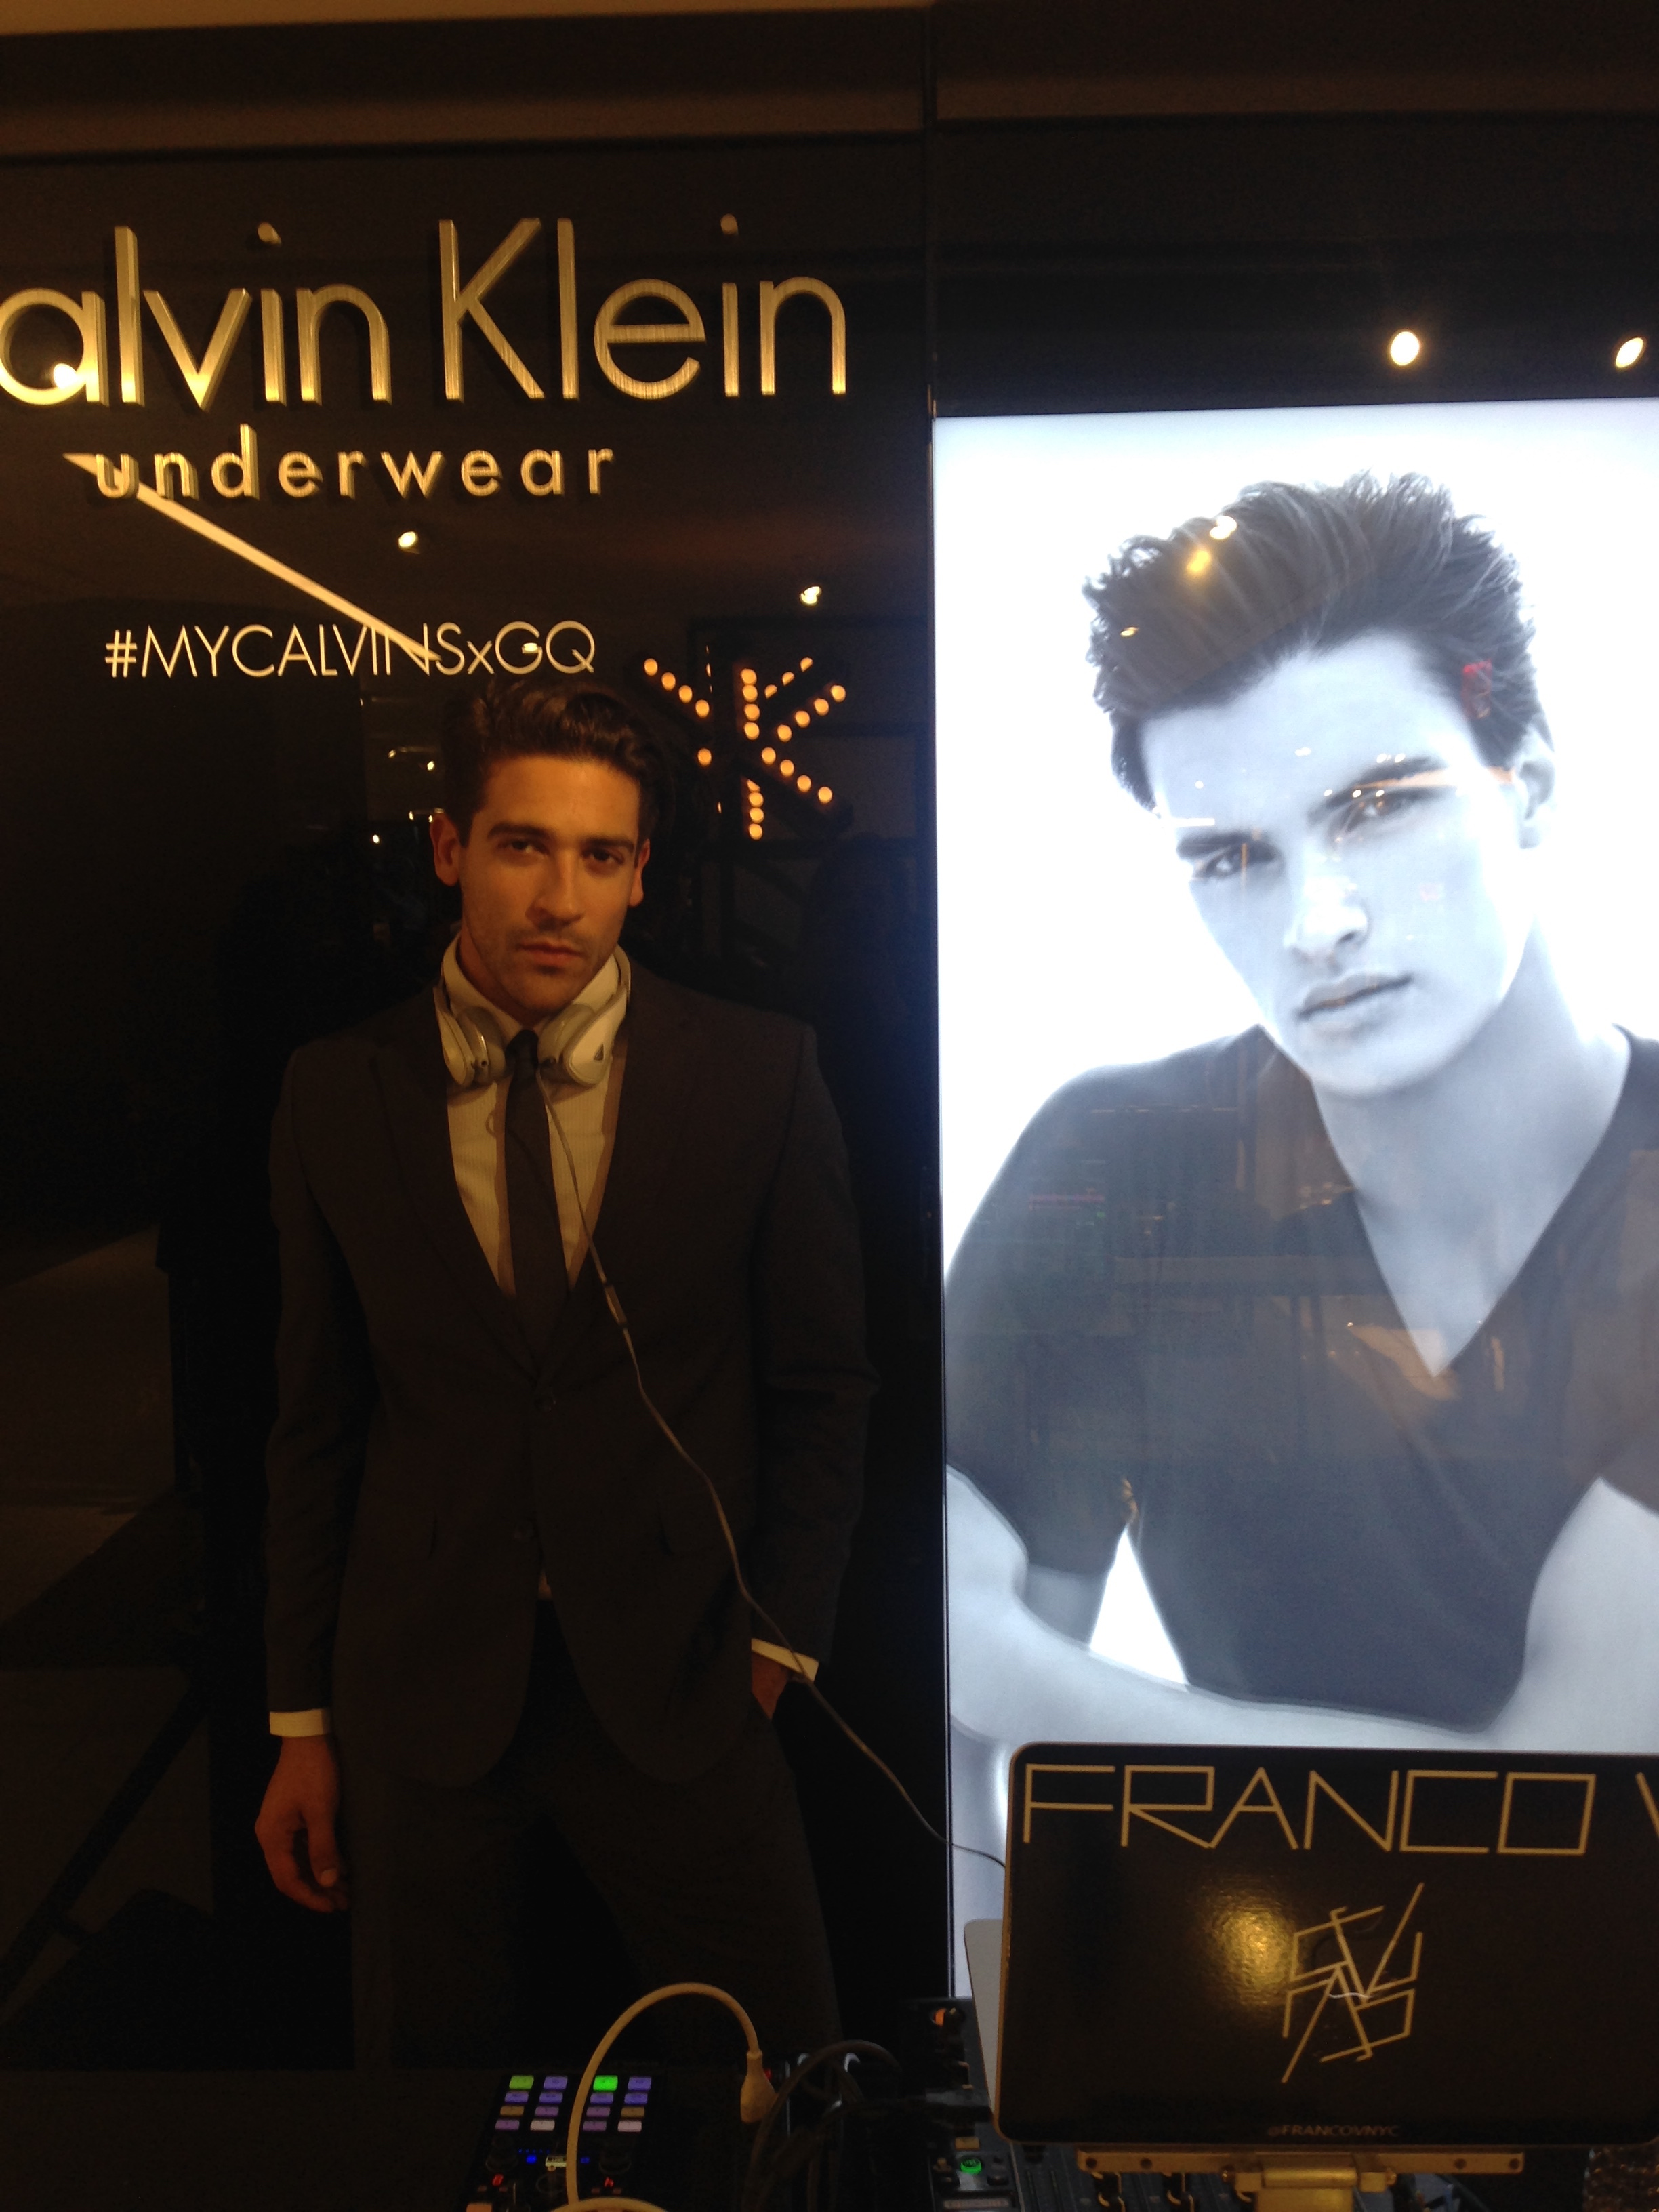 Franco V Djing for Calvin Klein x GQ